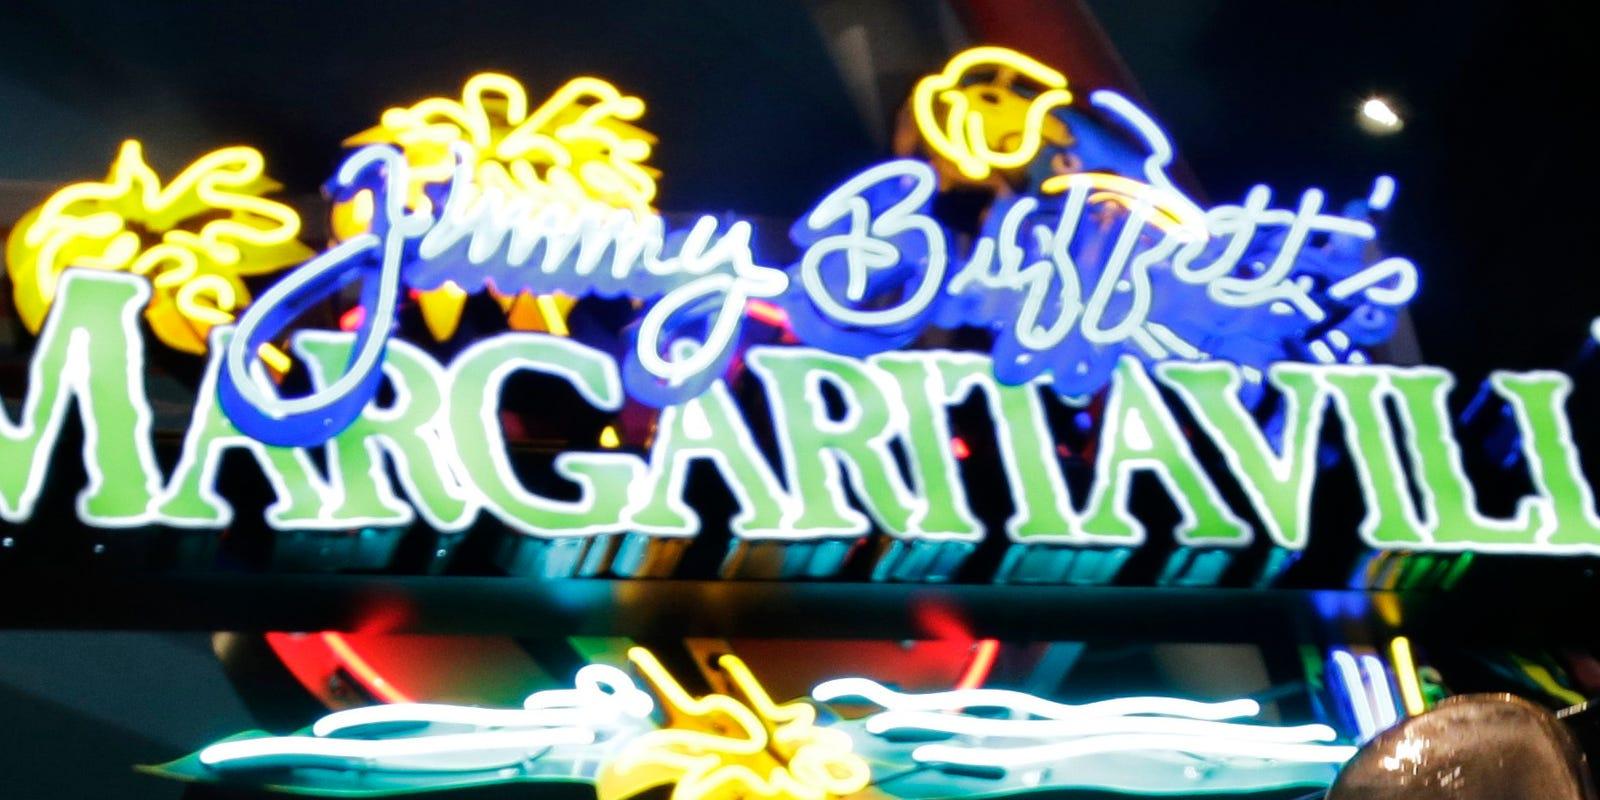 Biloxi Margaritaville Casino Files For Bankruptcy